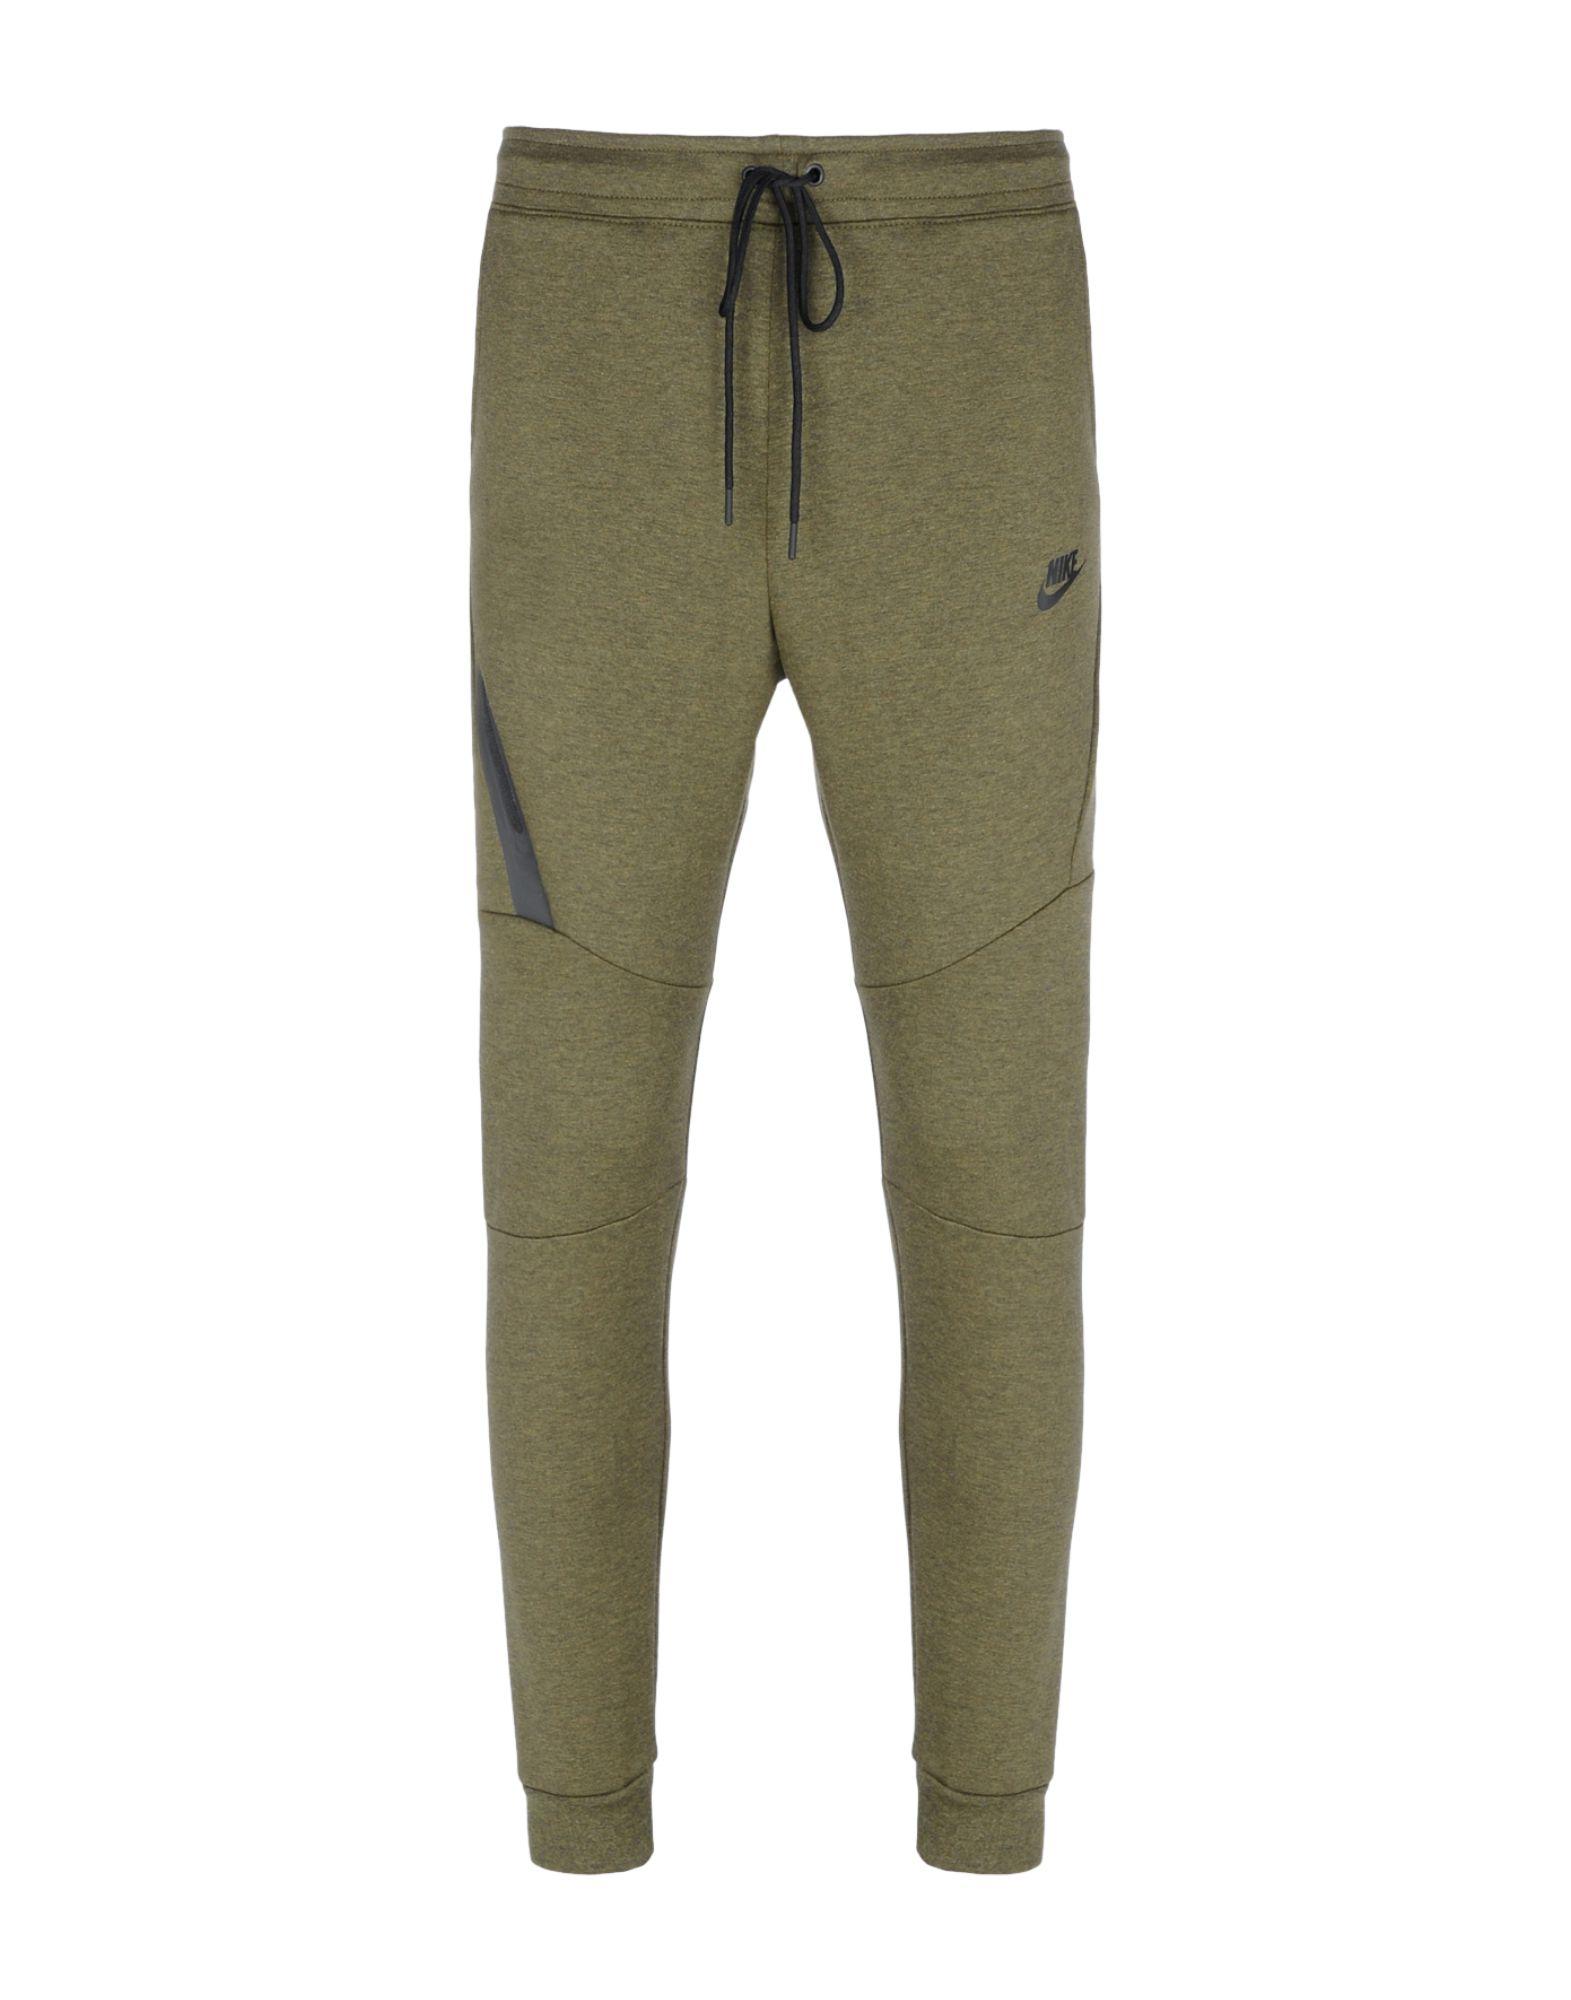 Adidas Homme Jogging Molleton Pantalon Expressionlibre 6wR8aZnxq